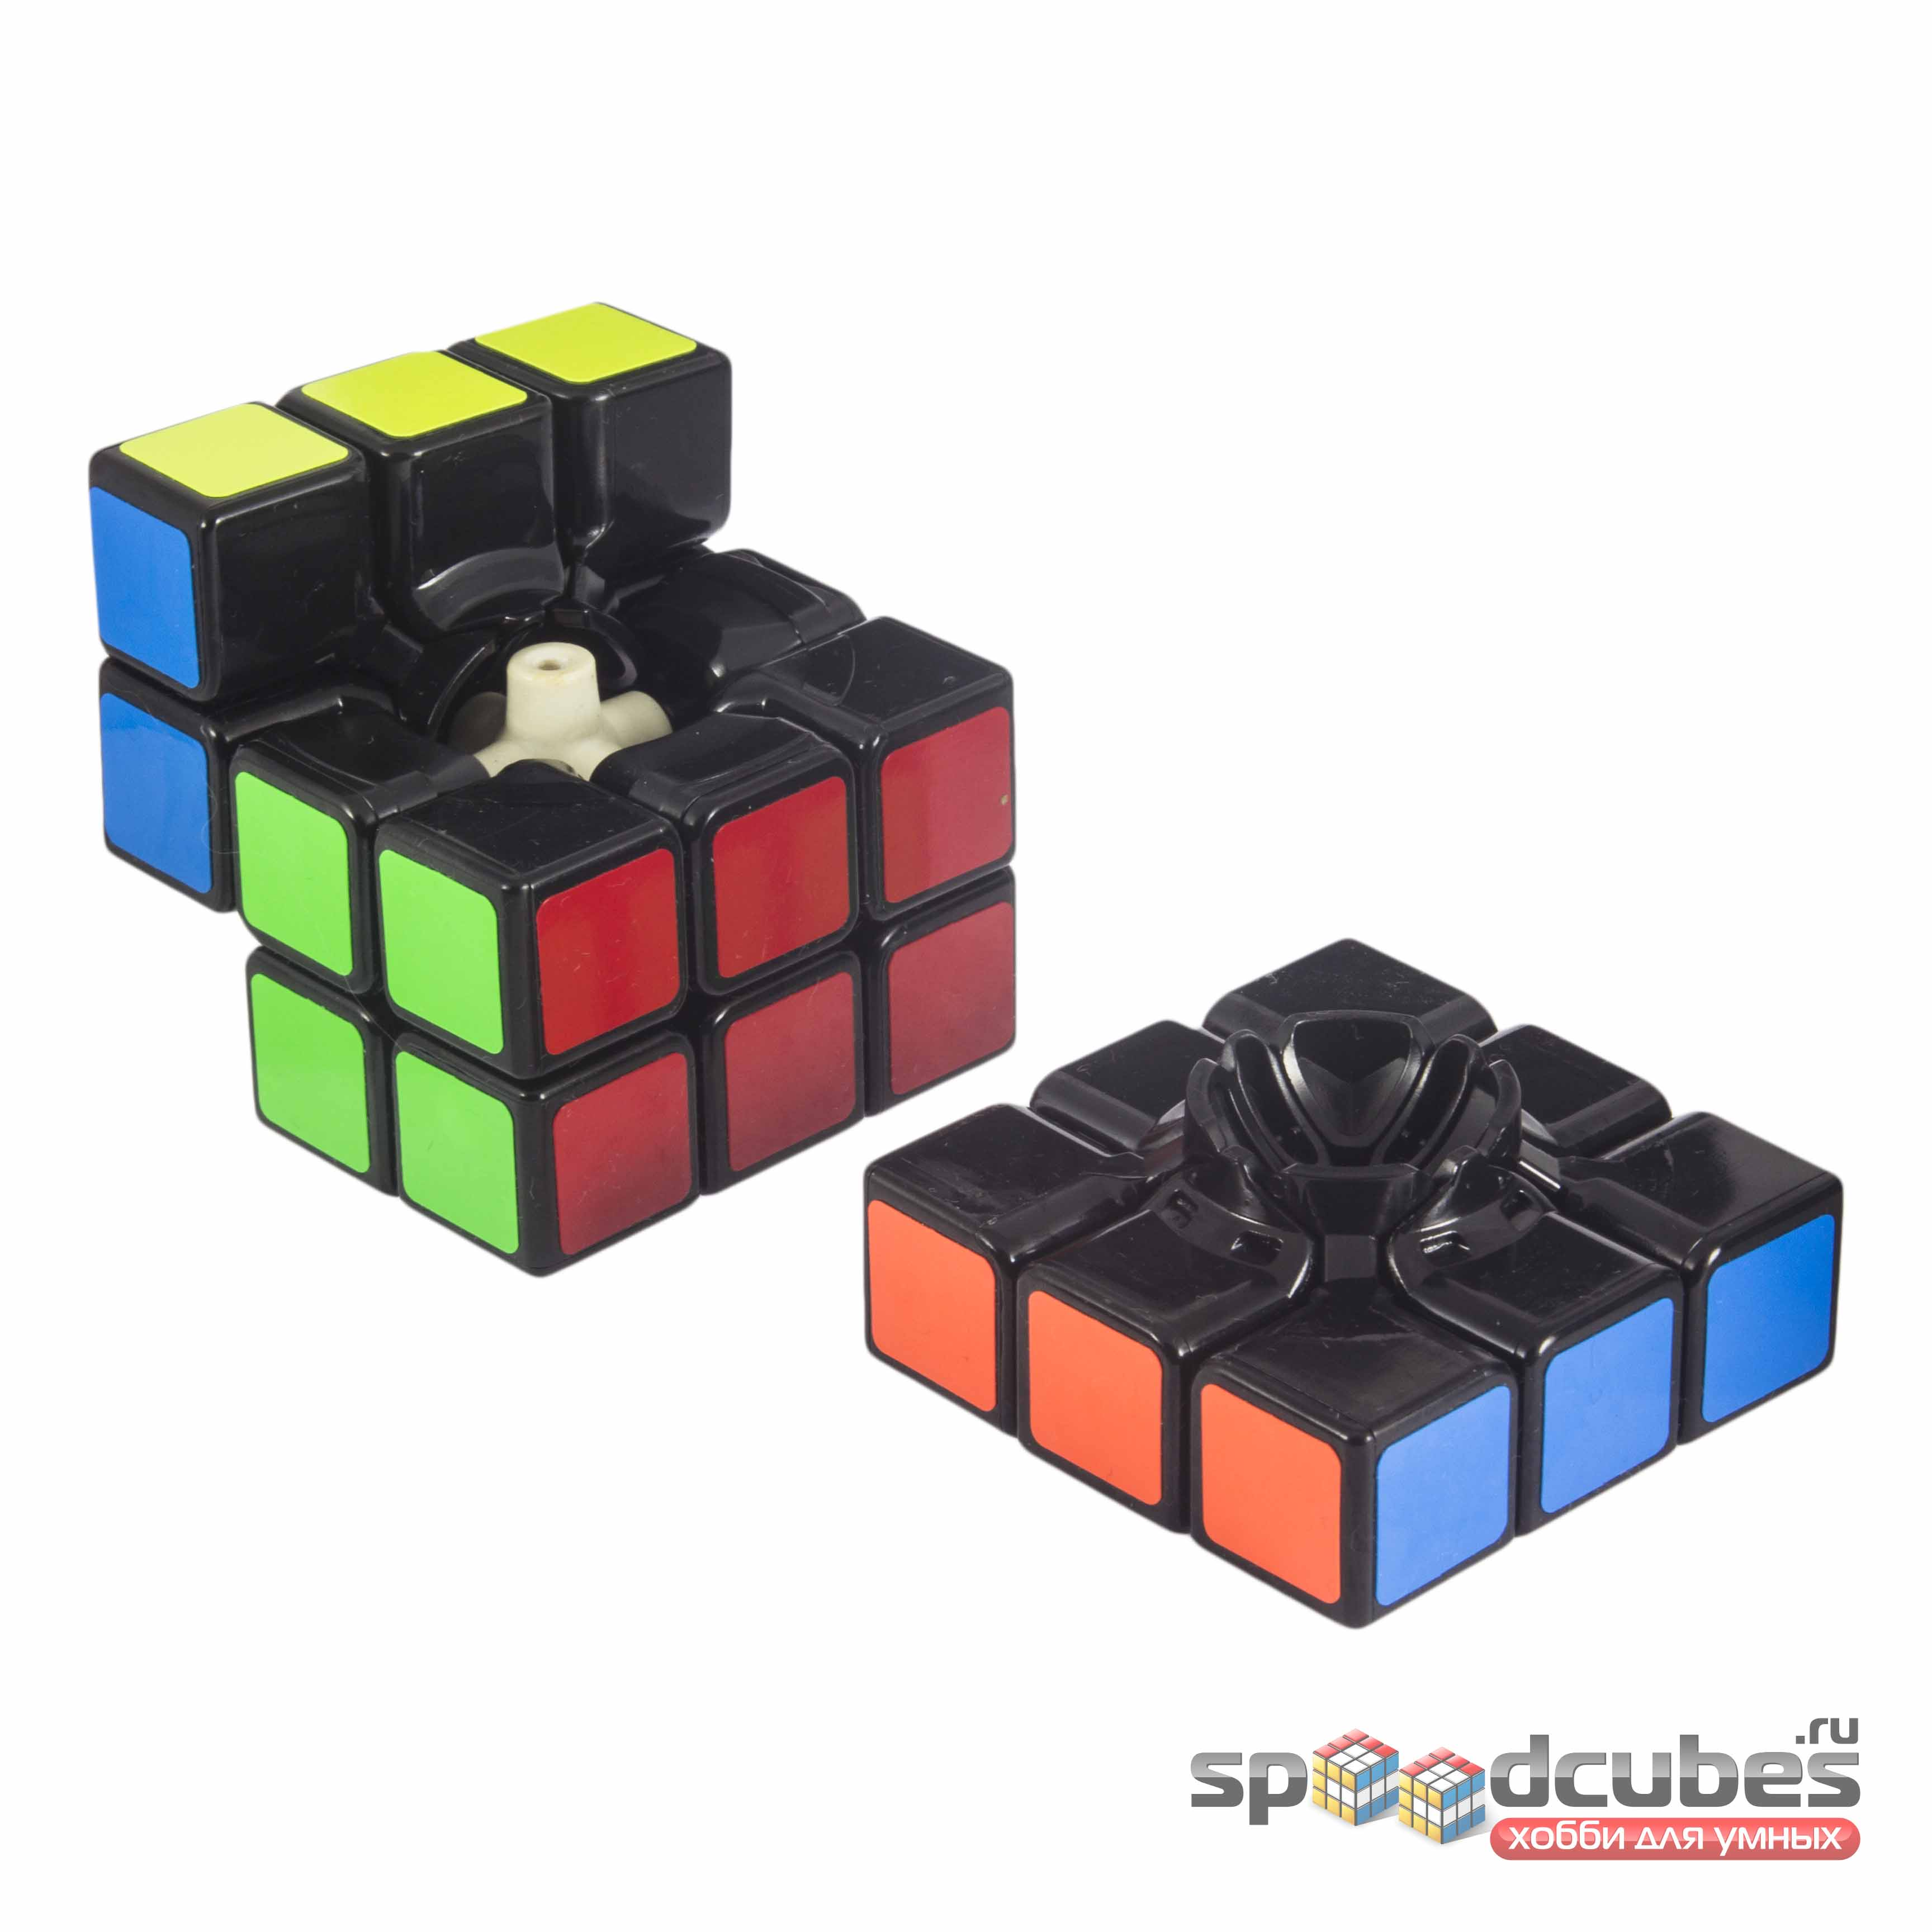 Shengshou 3x3x3 Aurora Black 4